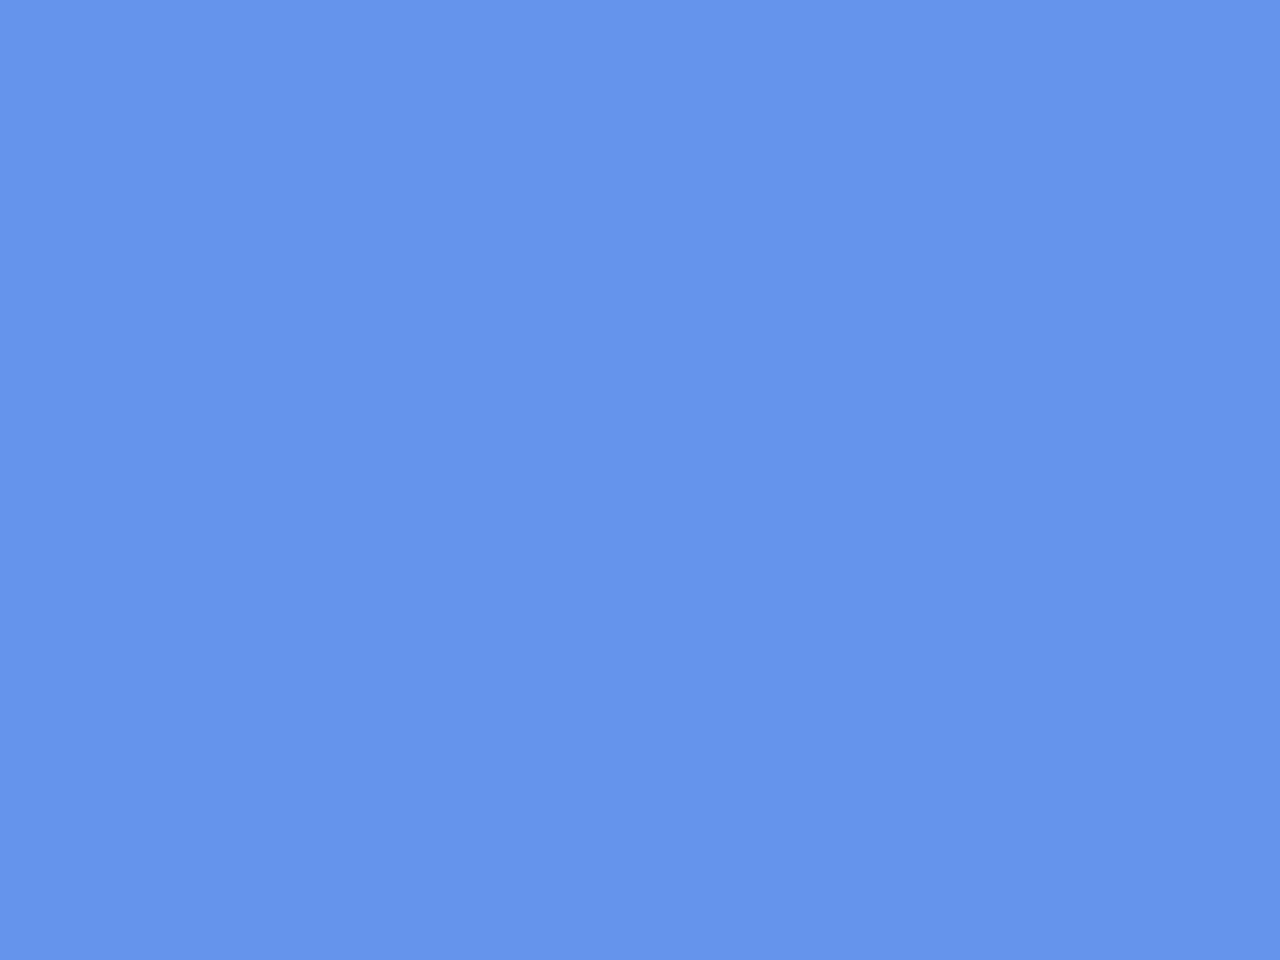 1280x960 Cornflower Blue Solid Color Background